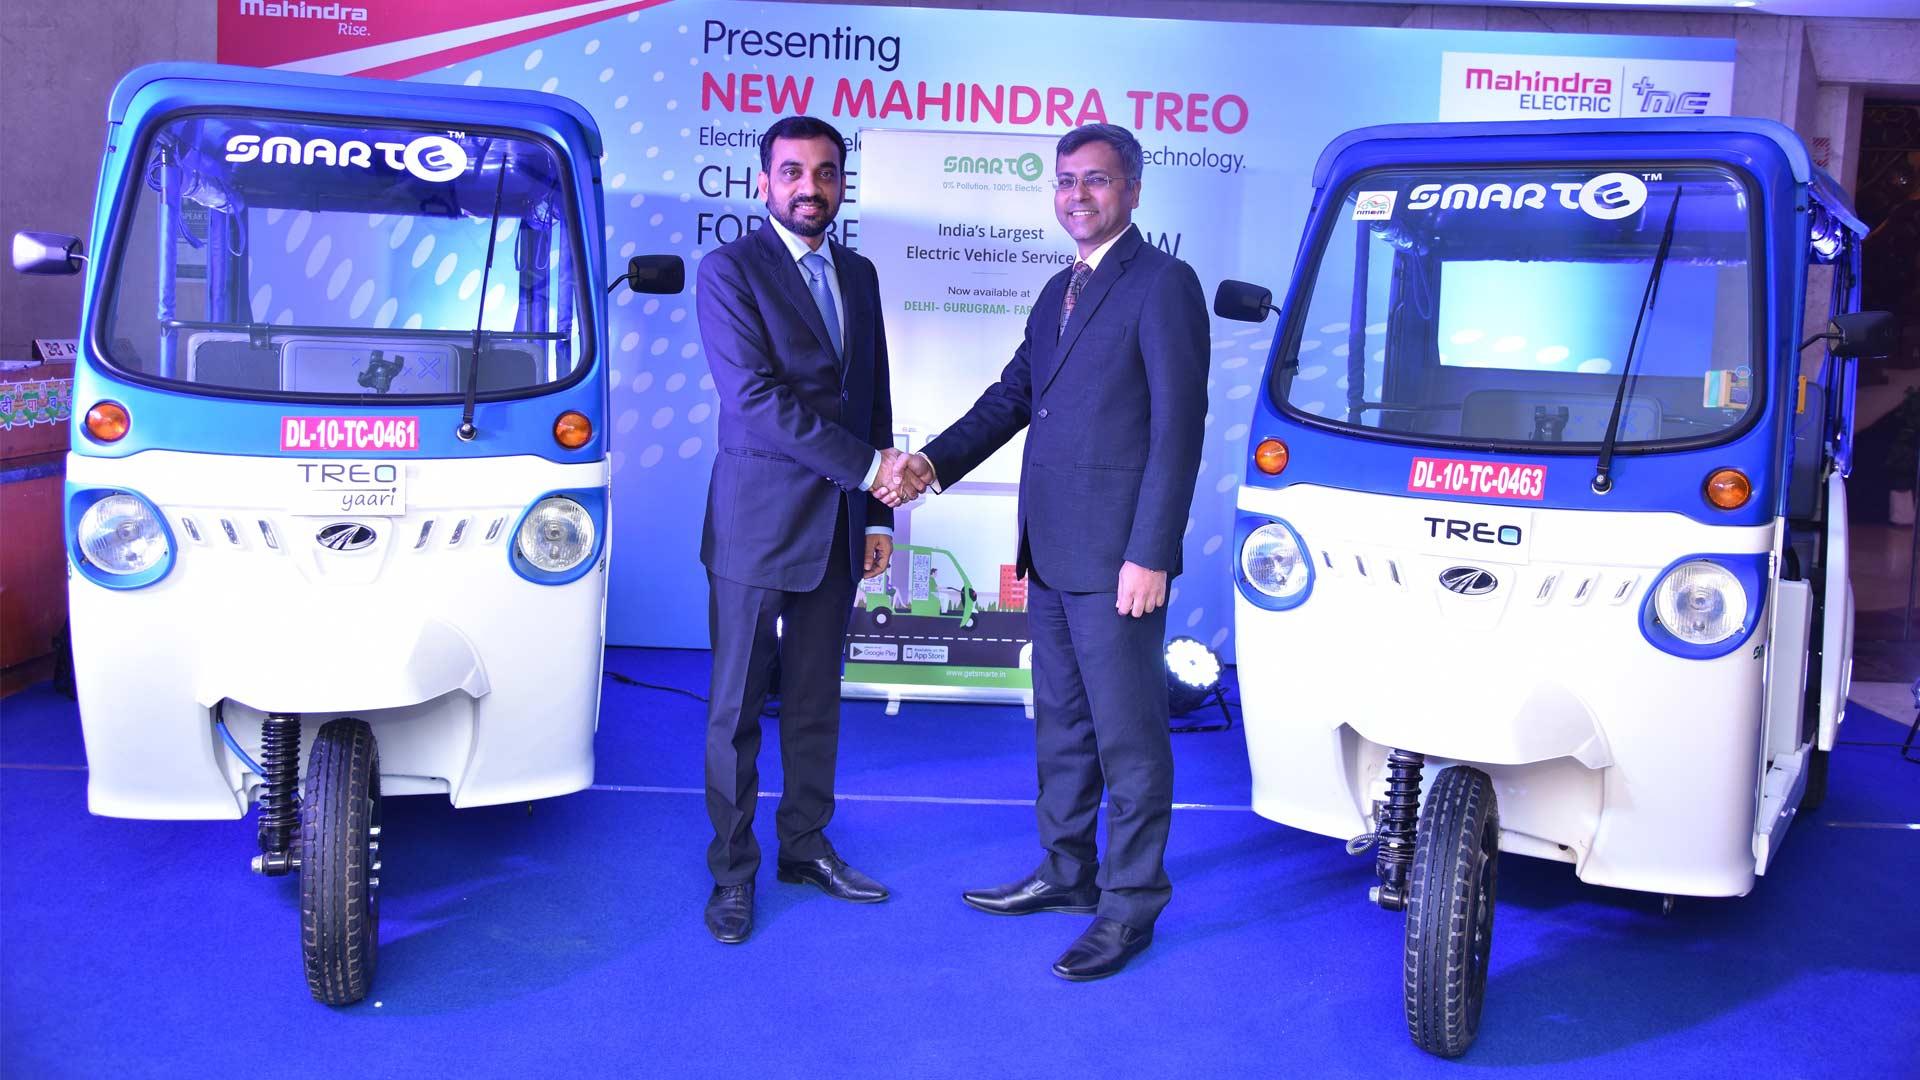 Mahindra Electric and SmartE Strategic Partnership